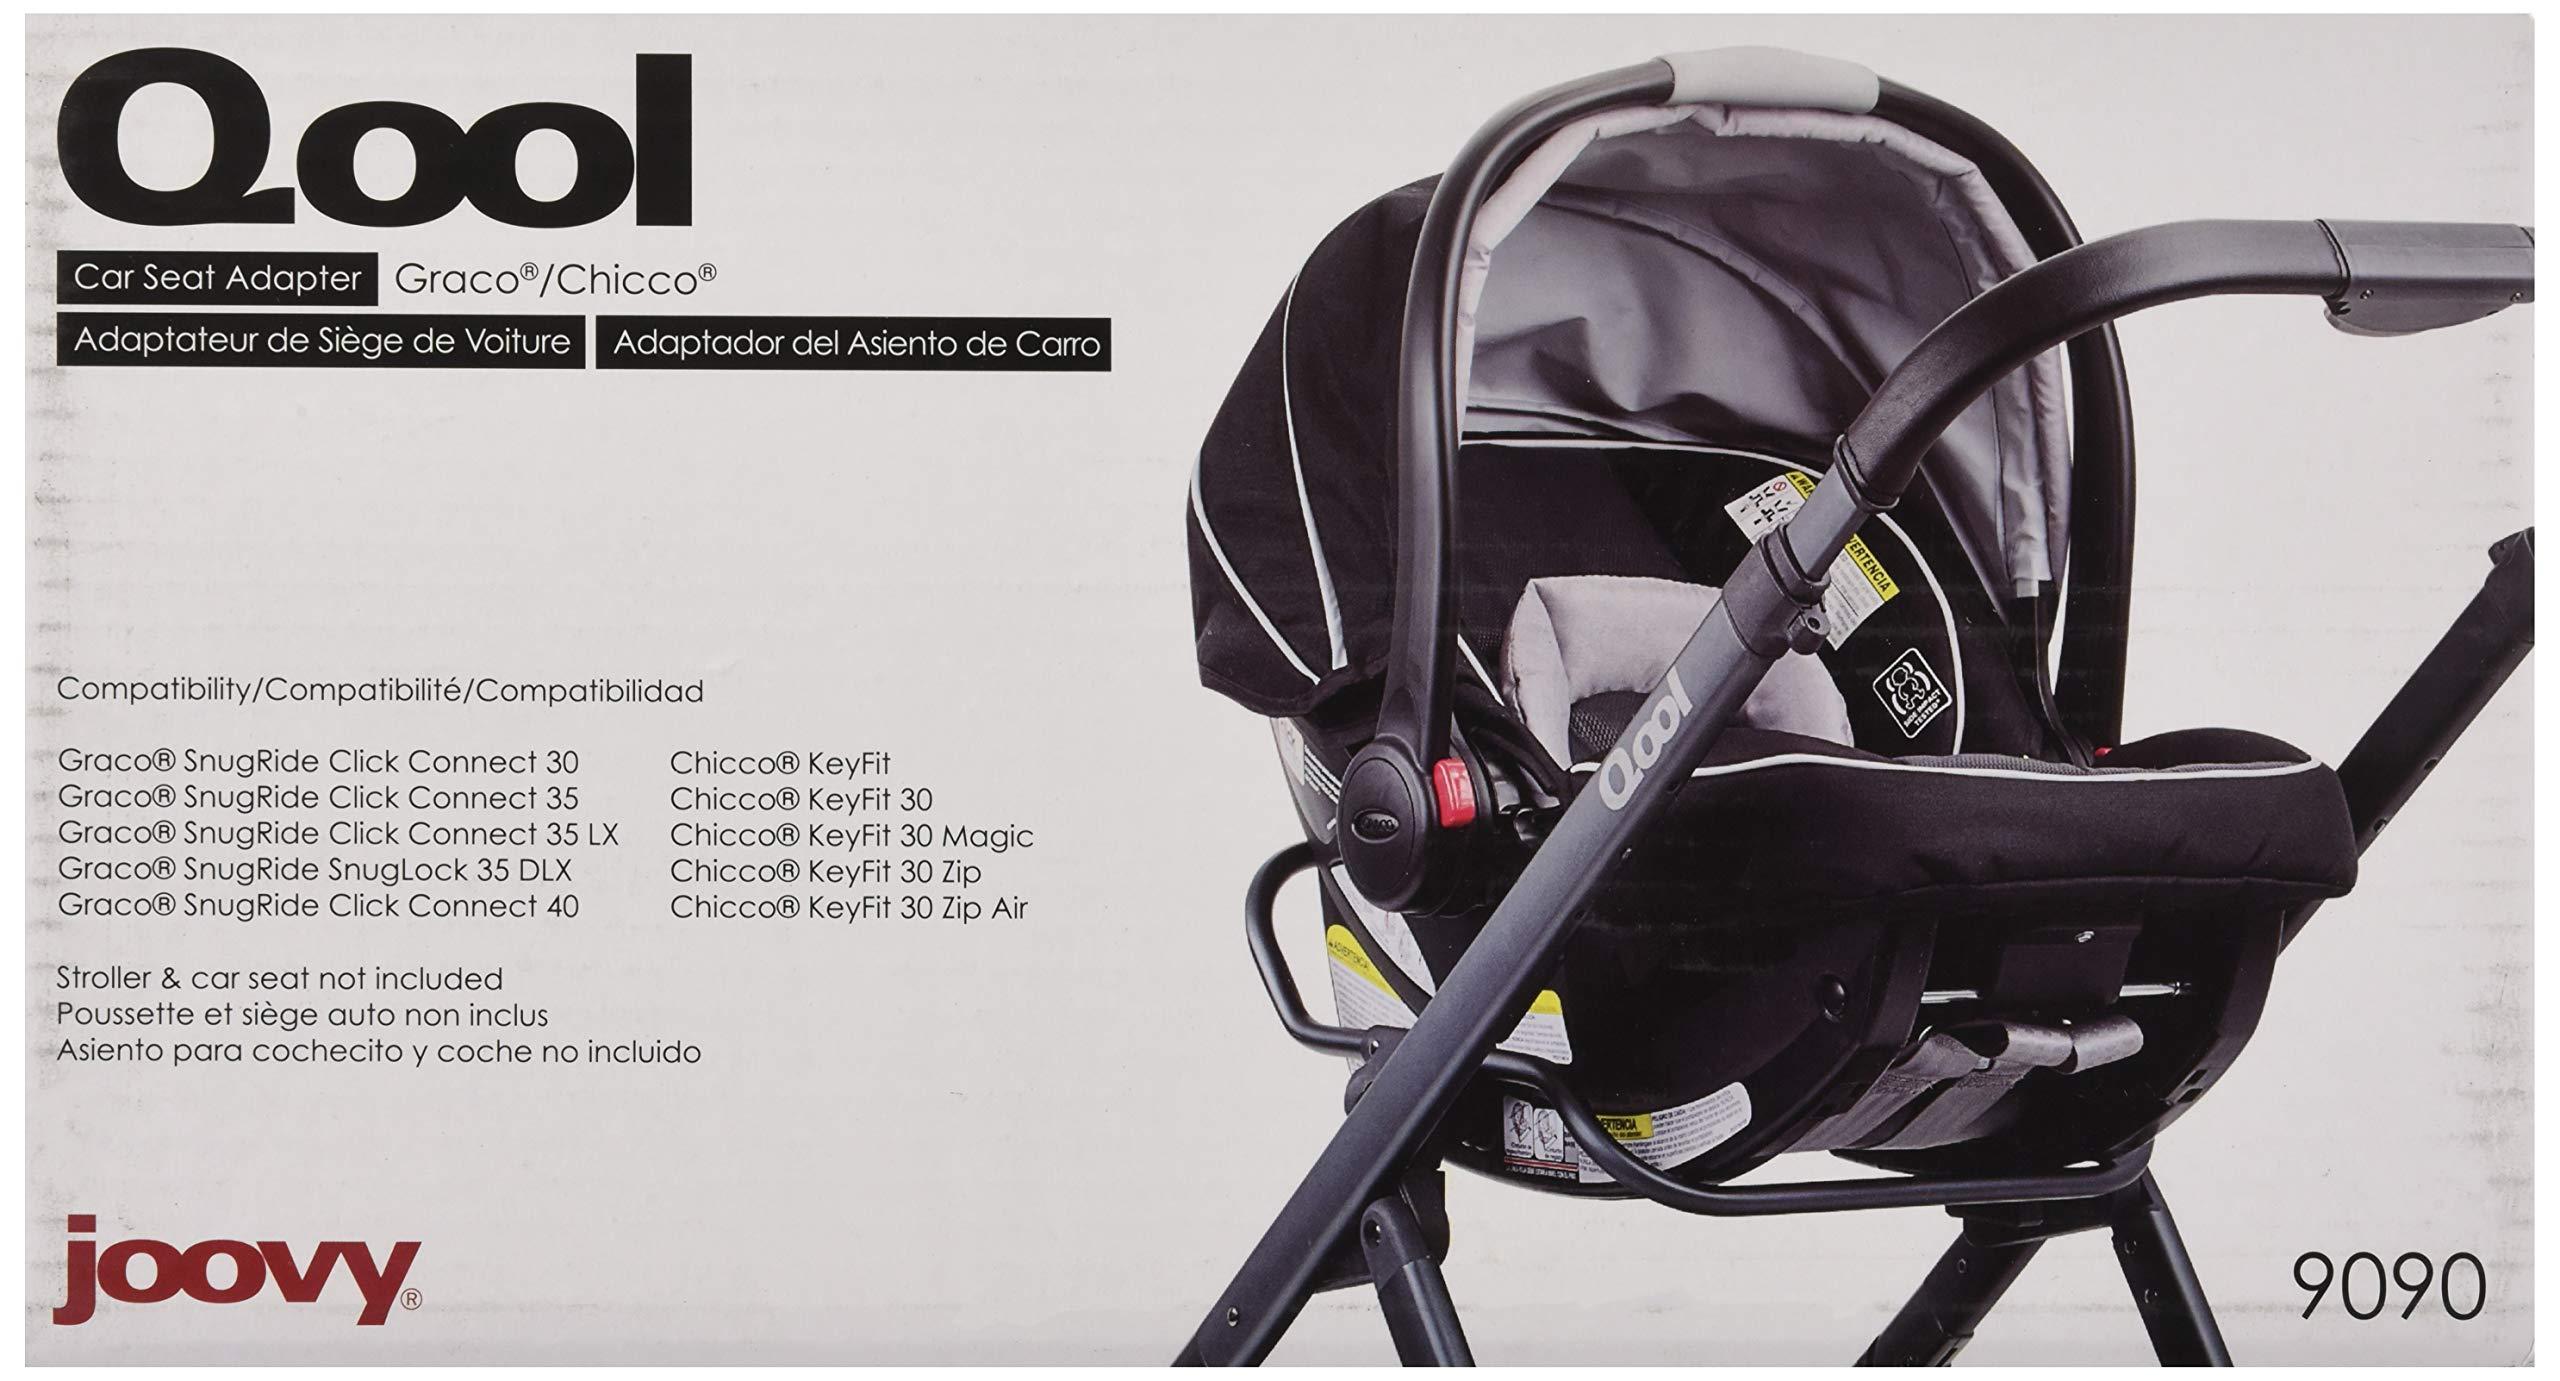 JOOVY Qool Car Seat Adapter, Graco/Chicco by Joovy (Image #6)